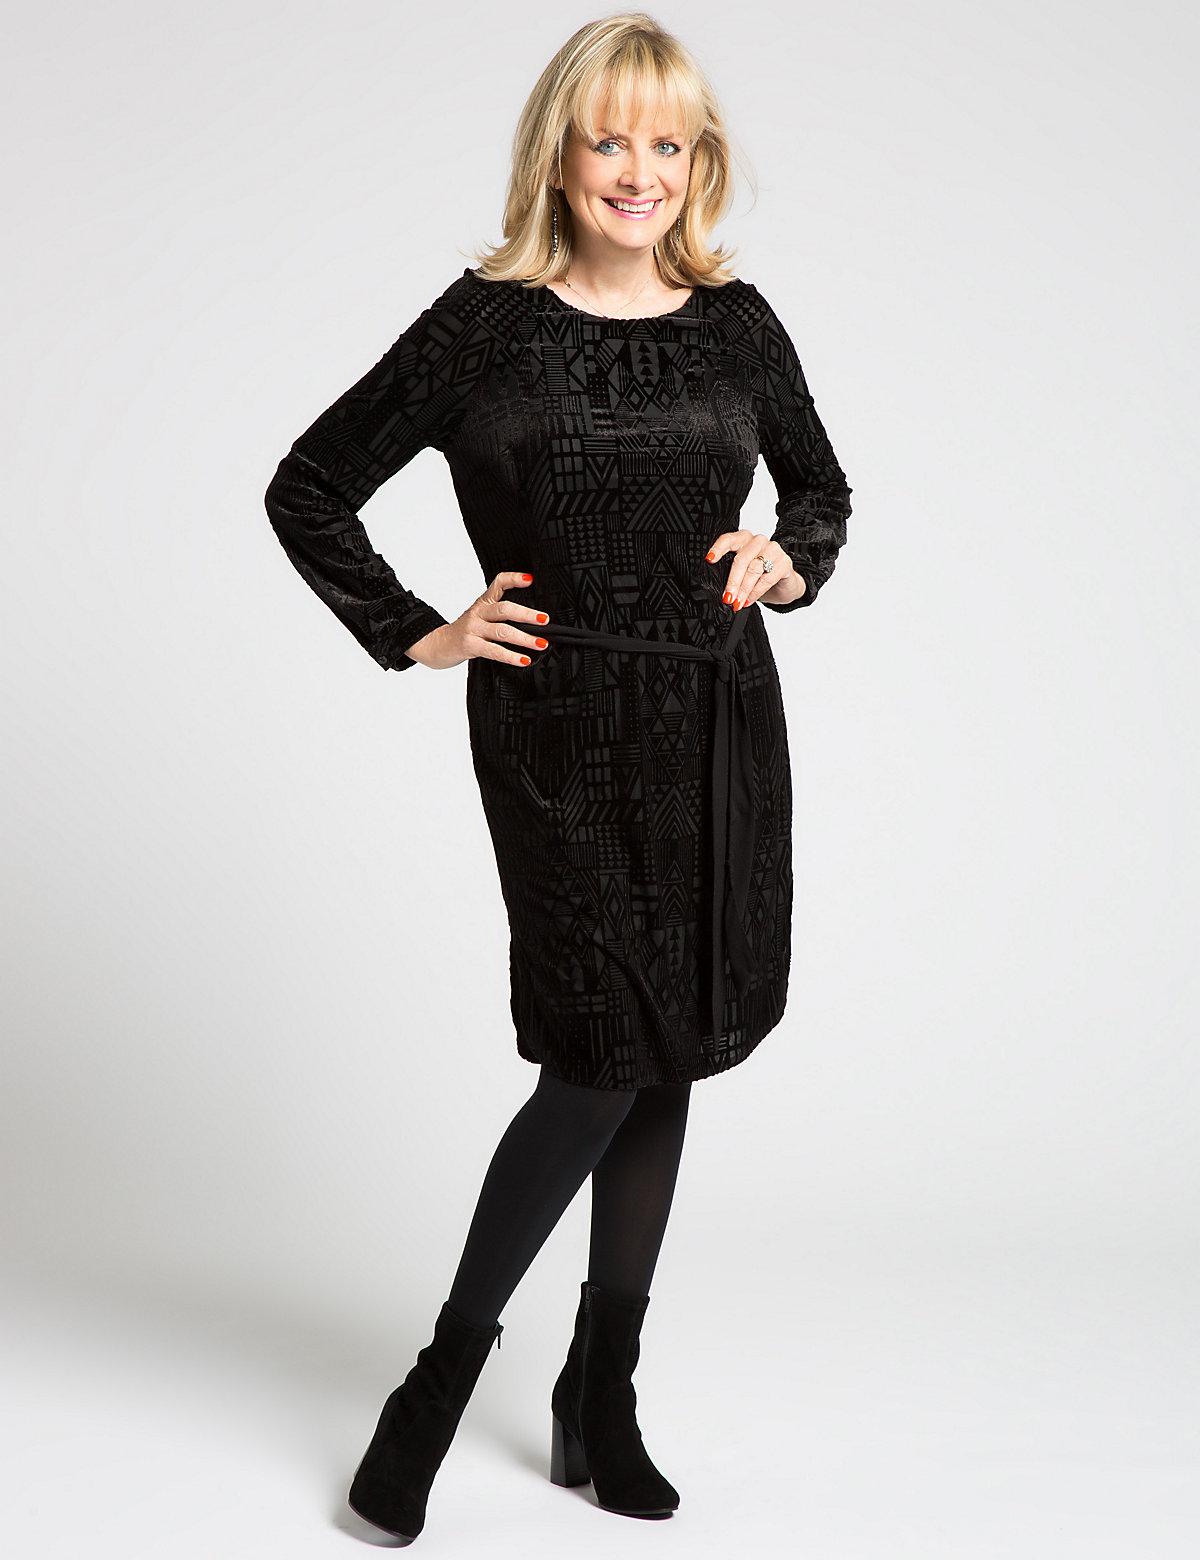 Designed by Twiggy Devore Shift Dress with Belt